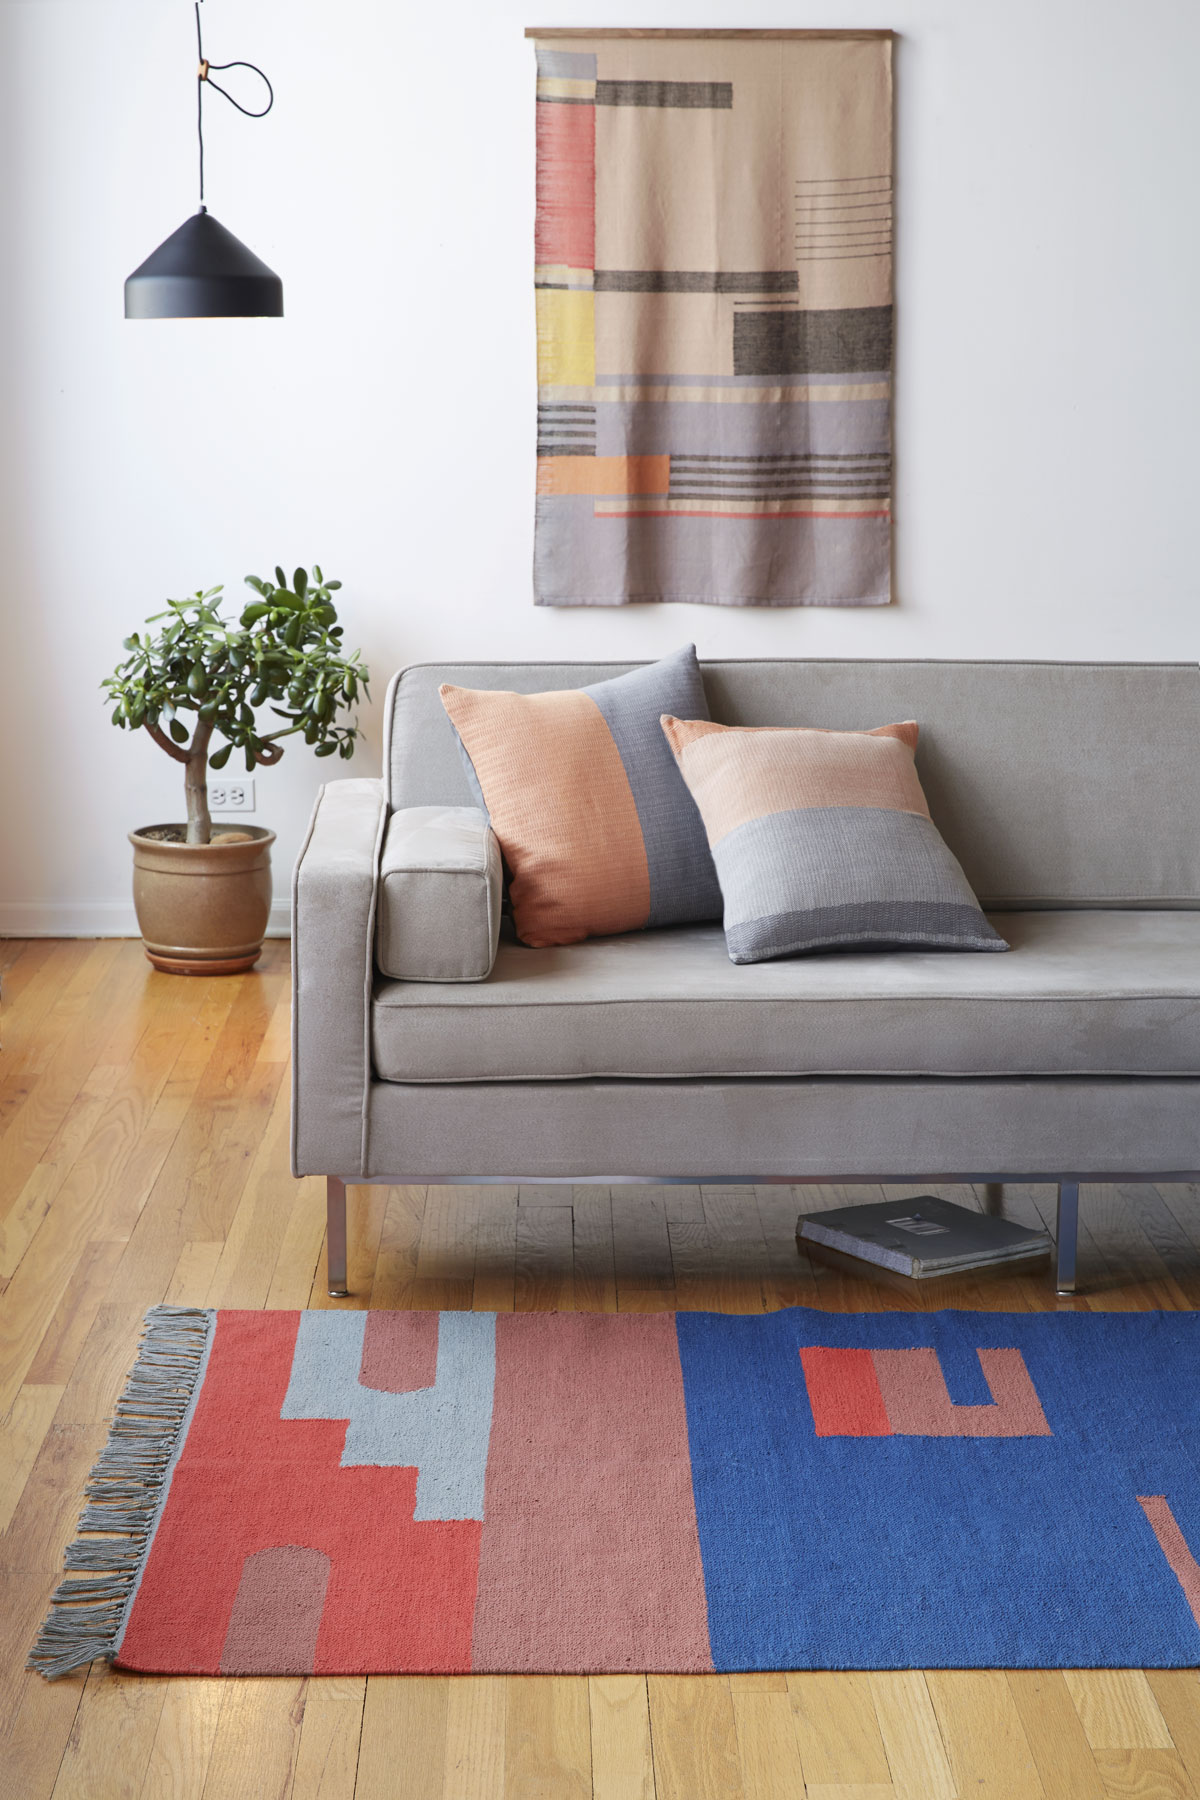 herron-textiles-studio-ss16-5.jpg